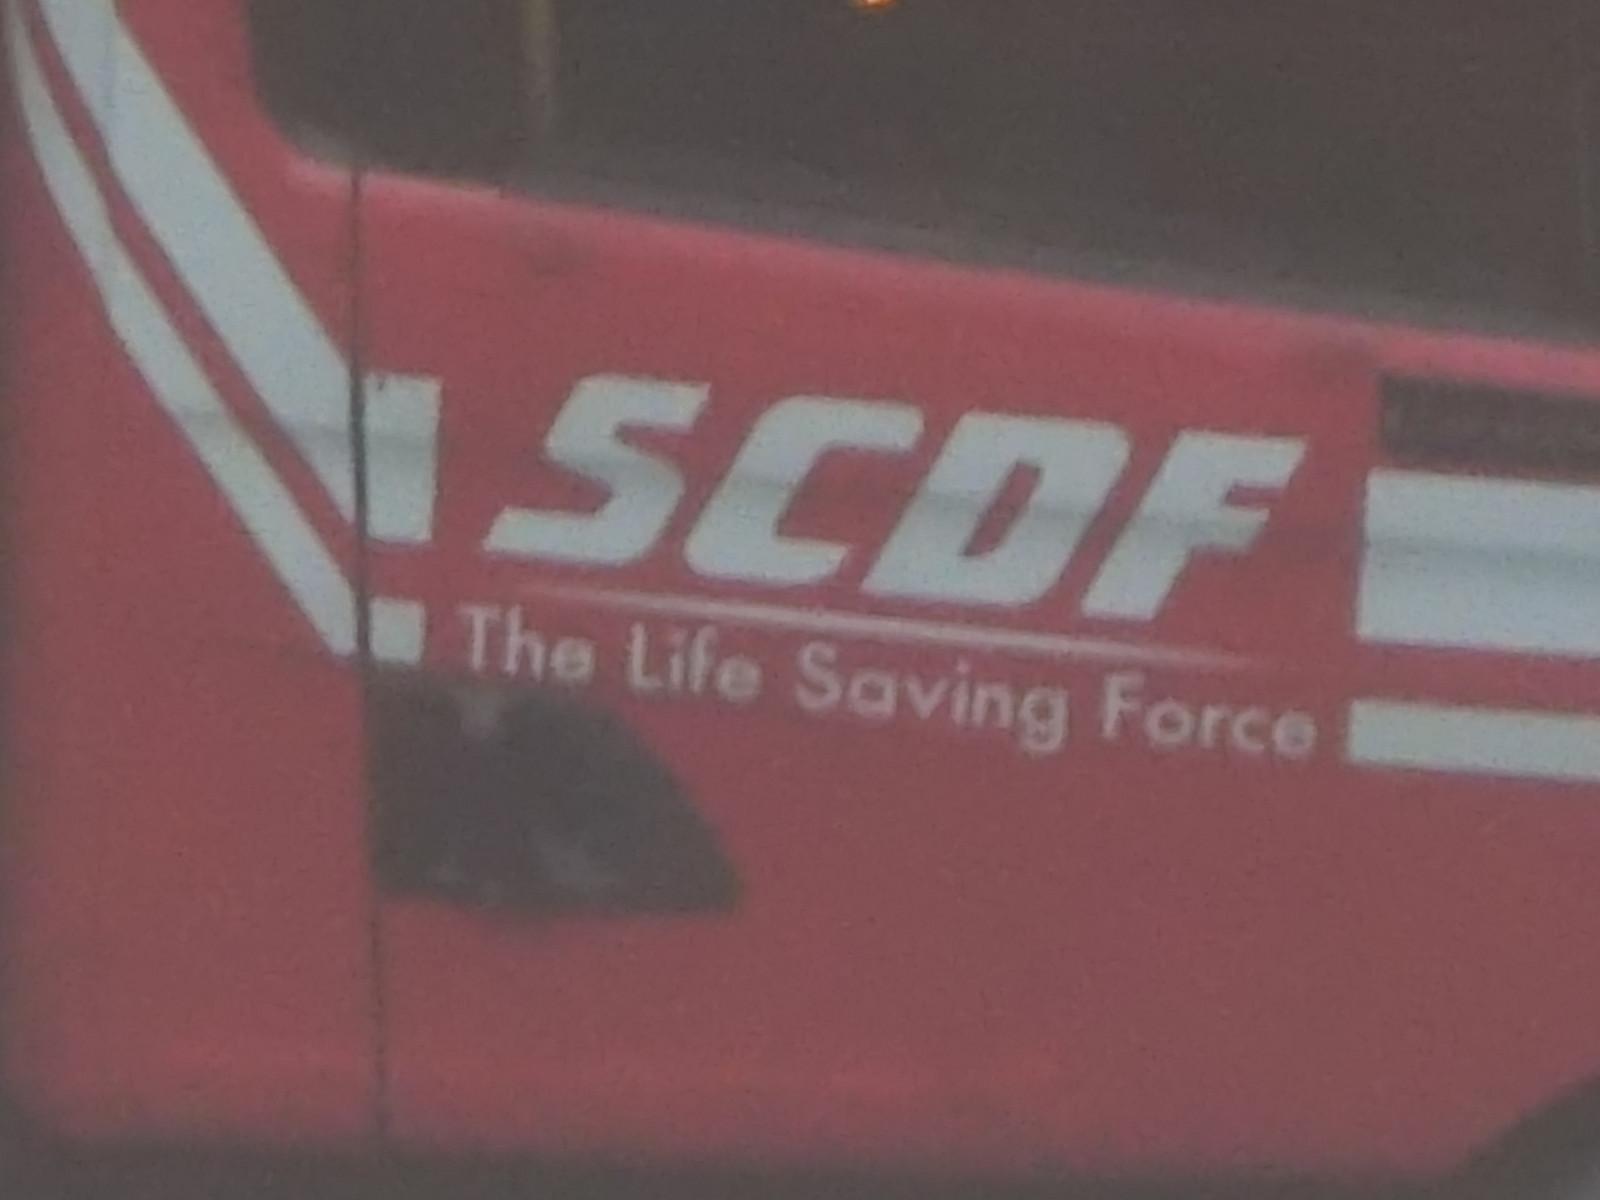 Scdf_2_2